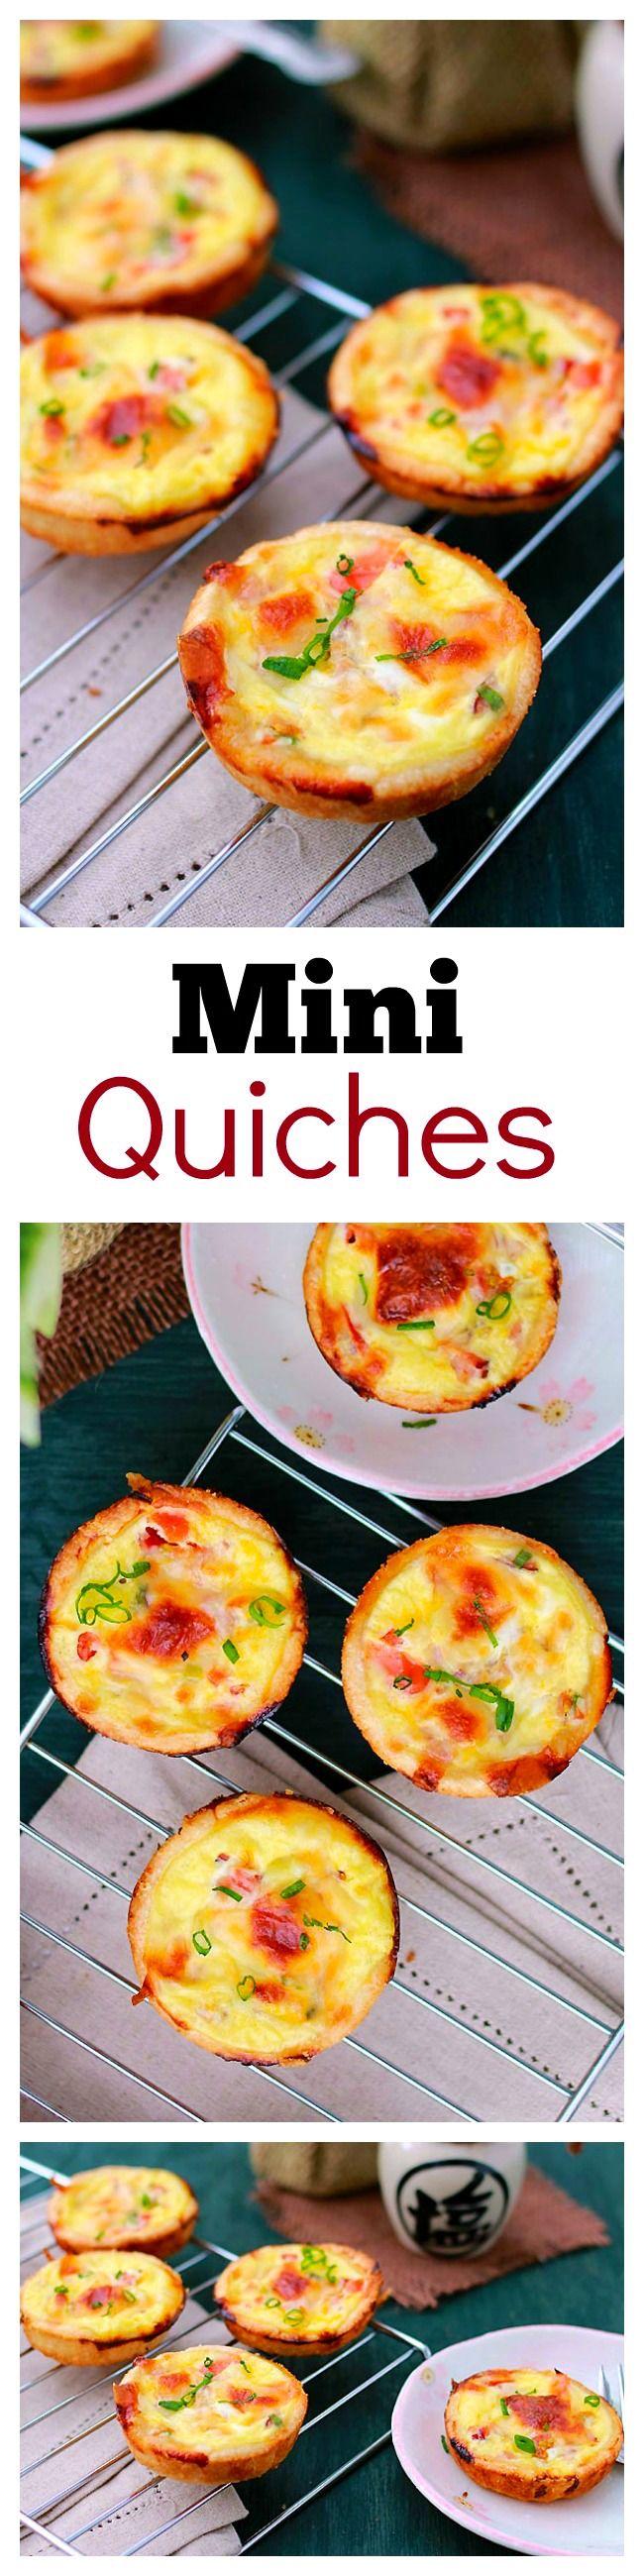 Mini Quiche – the BEST  easiest quiche you'll ever make, in mini size. So creamy, rich, delicious with this fool-proof mini quiche recipe!!! | https://rasamalaysia.com #breakfast #recipe #brunch #easy #recipes